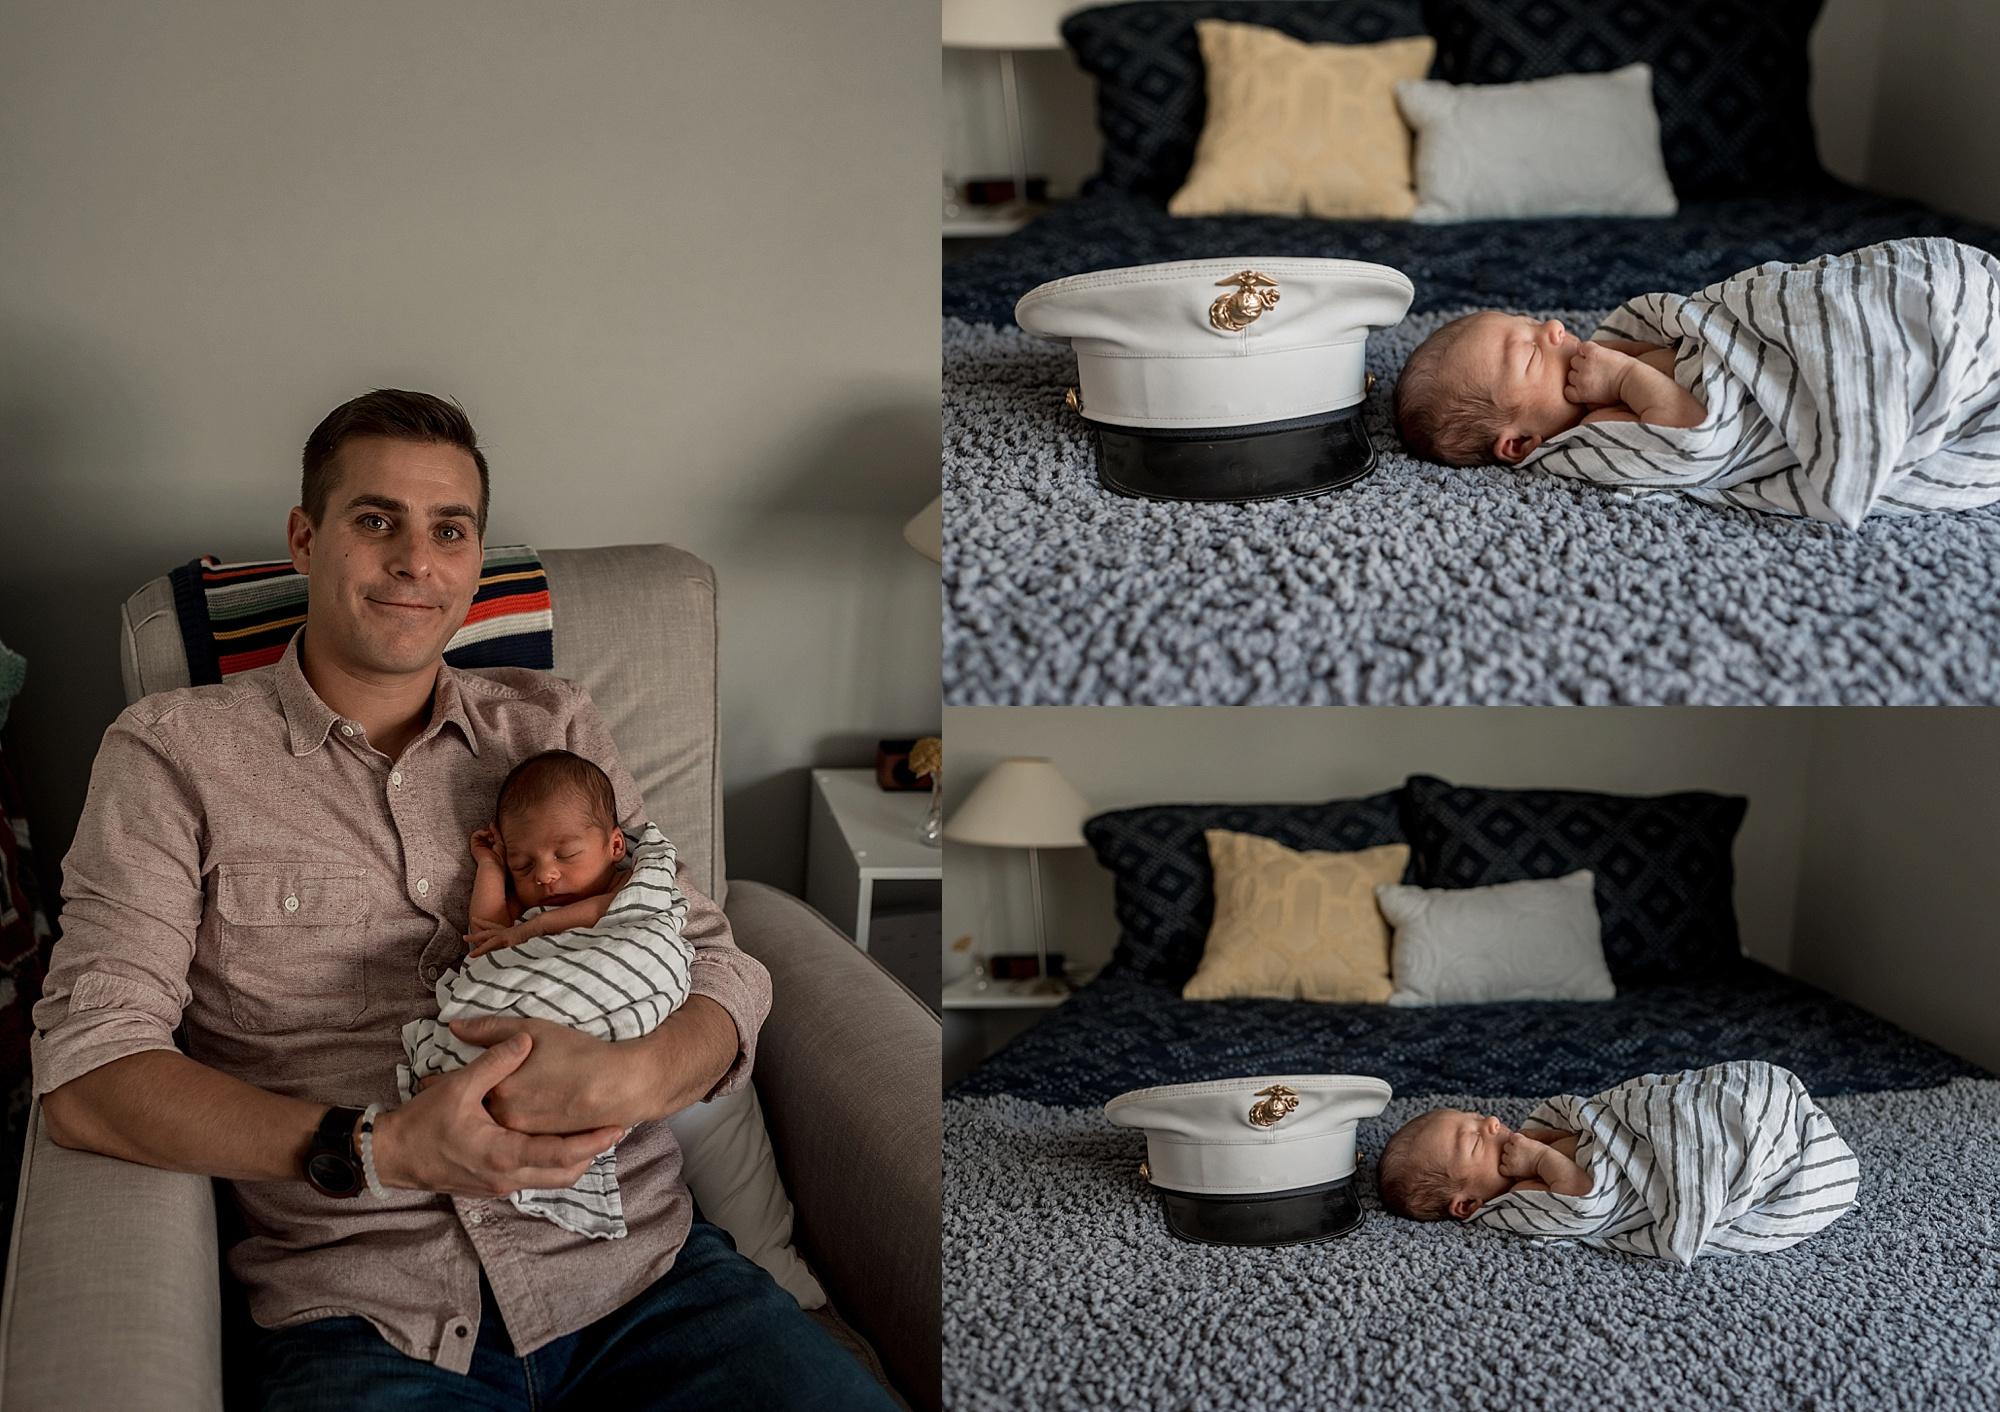 Welcome-baby-Cullin-akron-ohio-photographer-lauren-grayson-newborn-session_0033.jpg